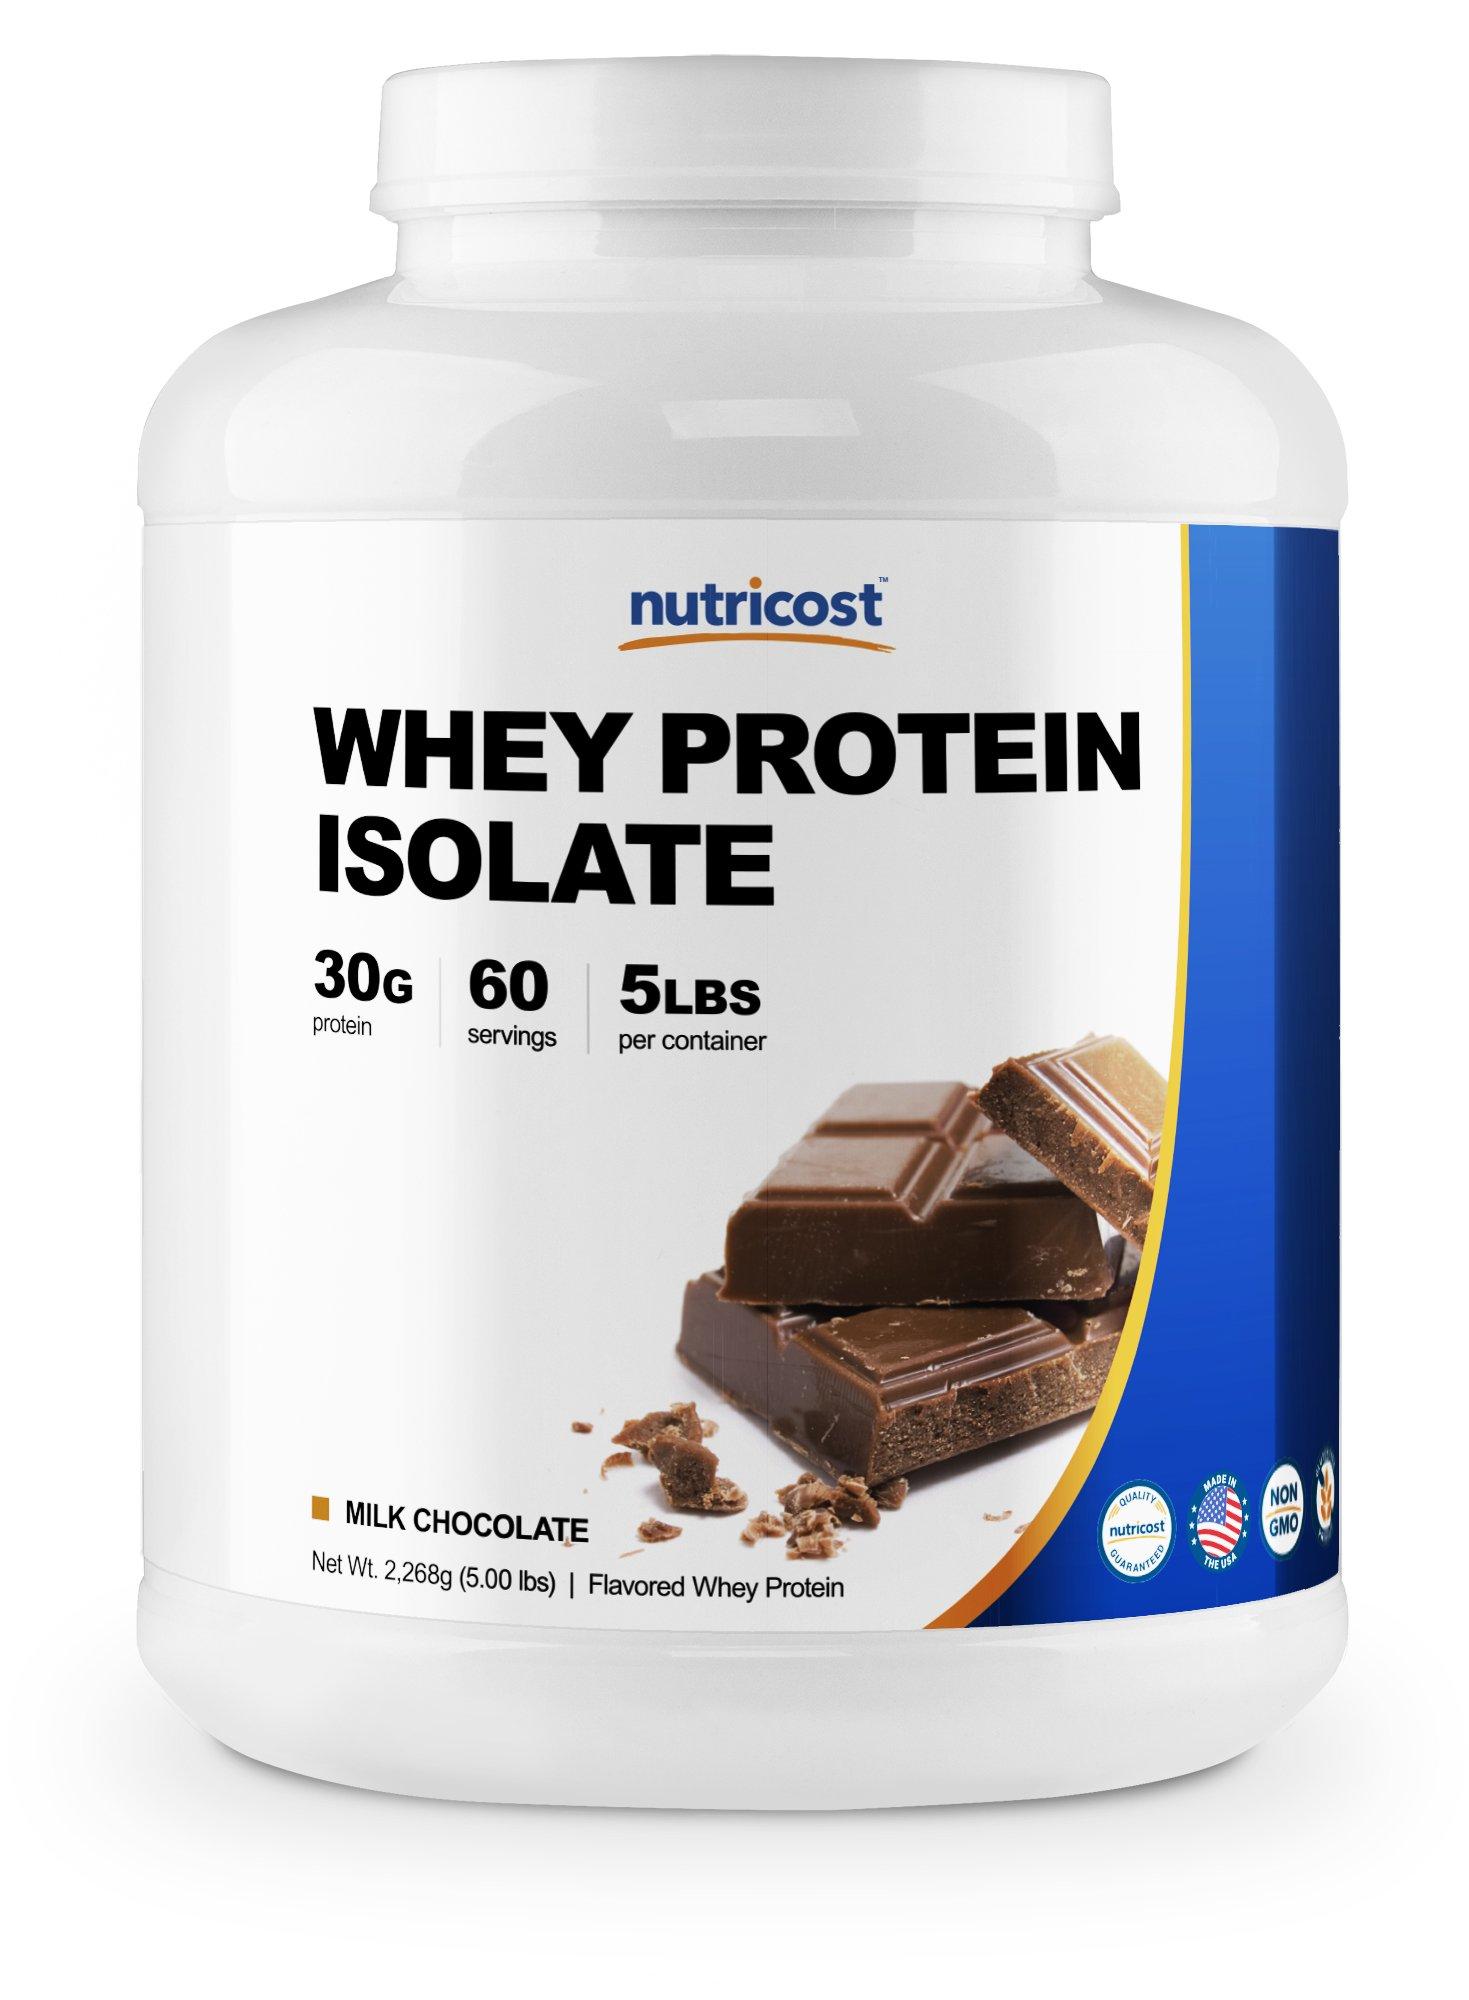 Nutricost Whey Protein Isolate Powder (Milk Chocolate) 5LBS